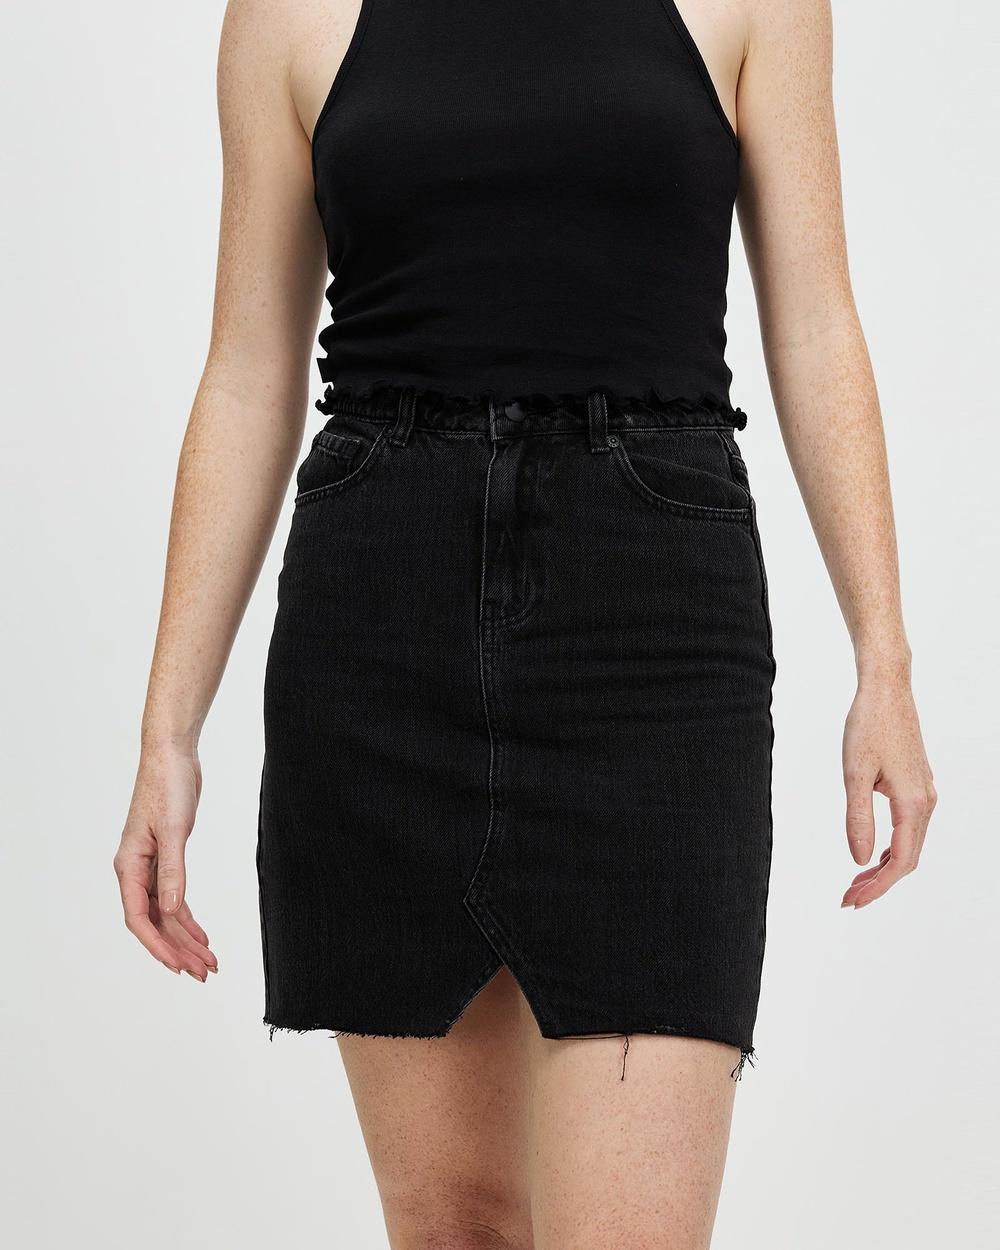 All About Eve Blair Split Skirt Denim skirts Washed Black